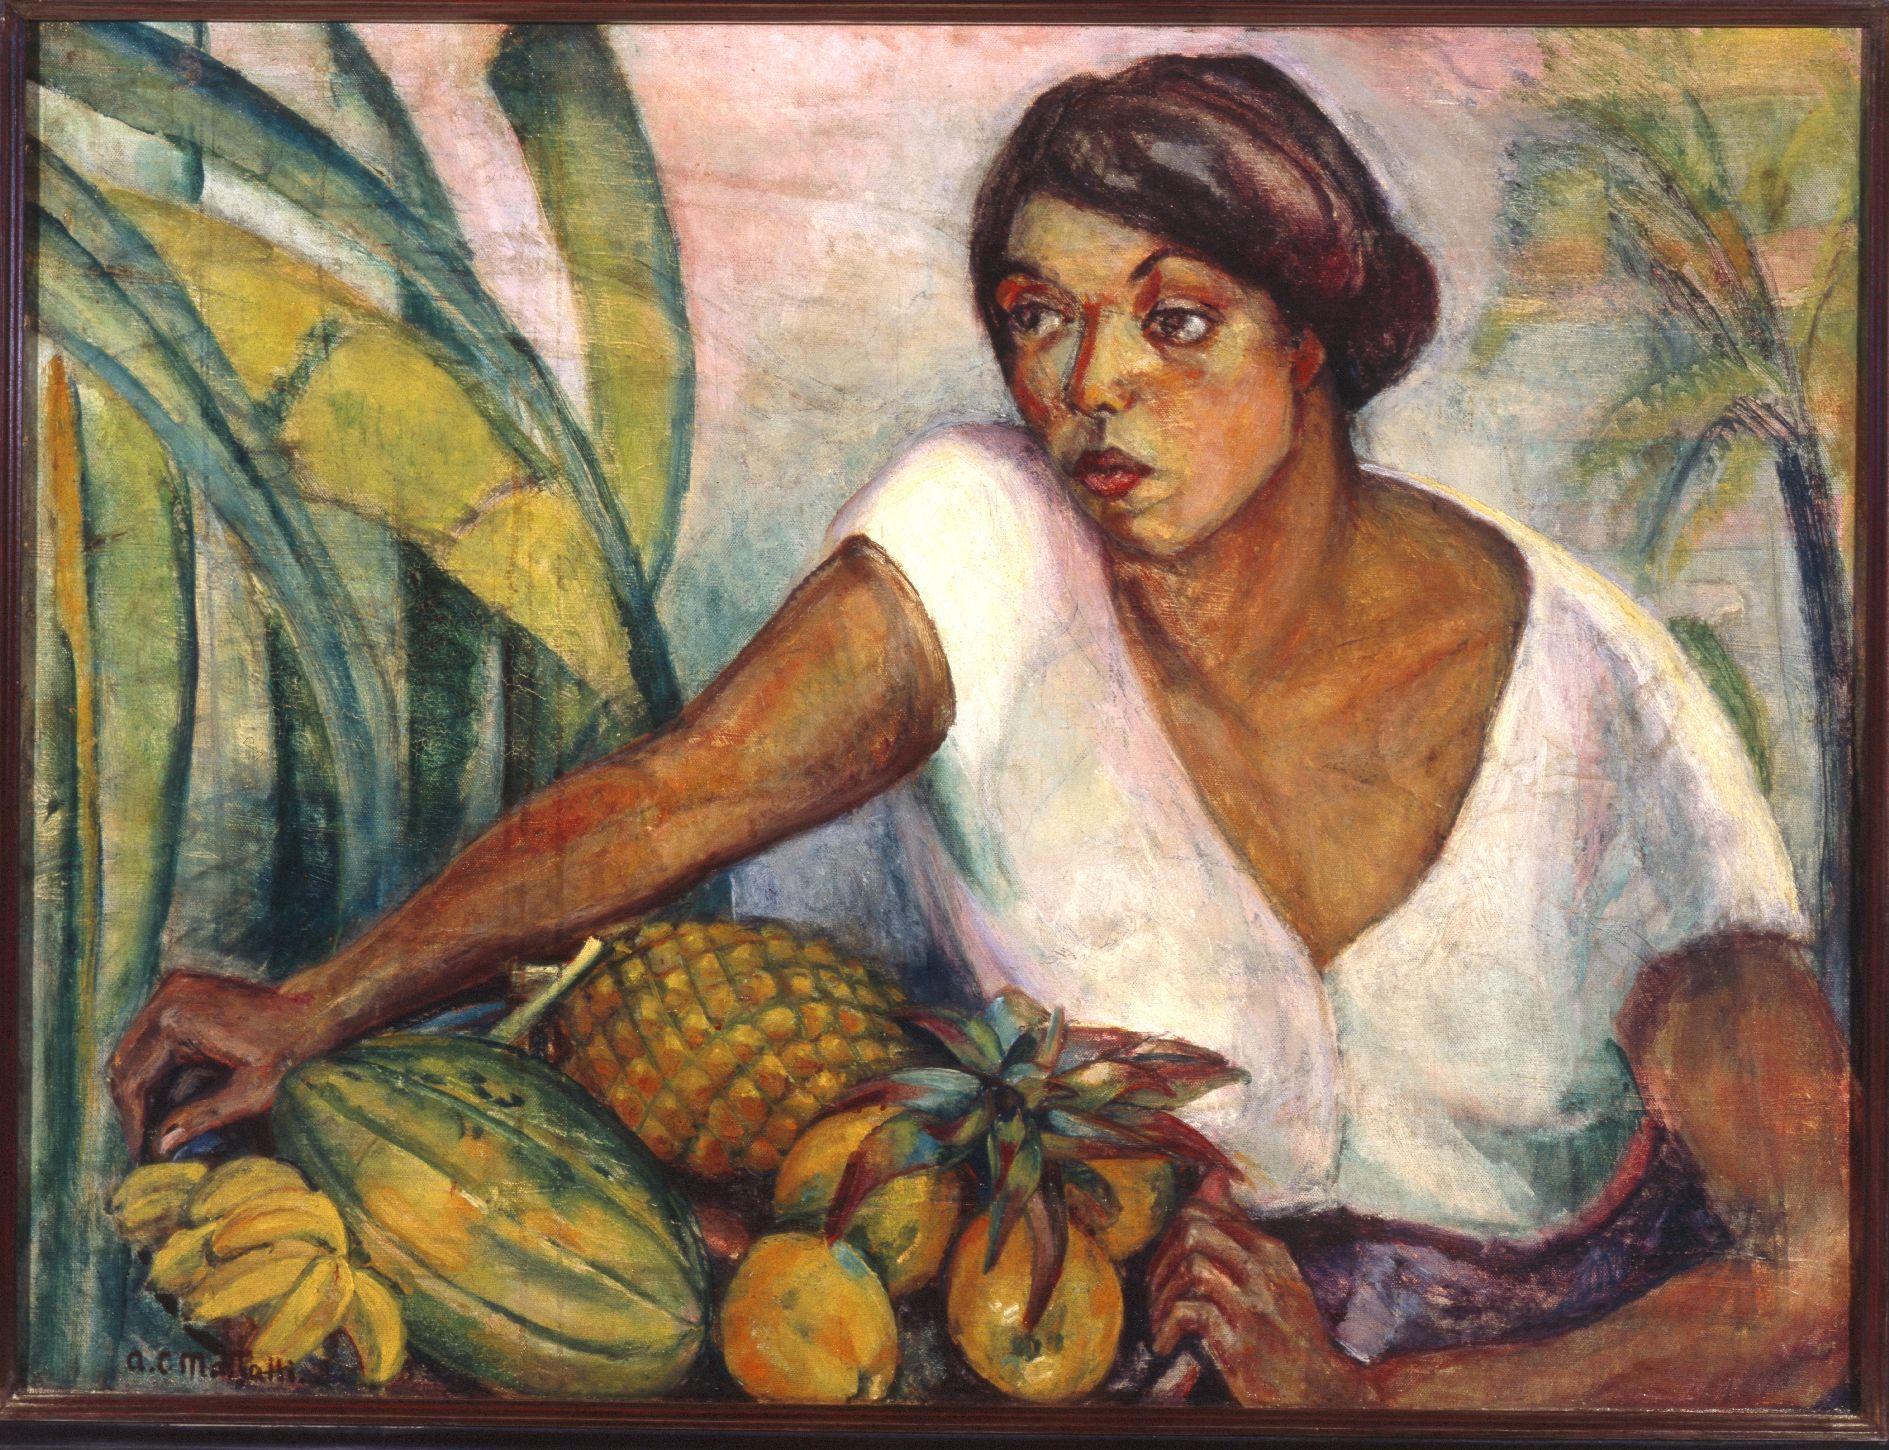 Tropical 1916 Anita Malfati 1889 1964 Oleo Sobre Tela 77 X